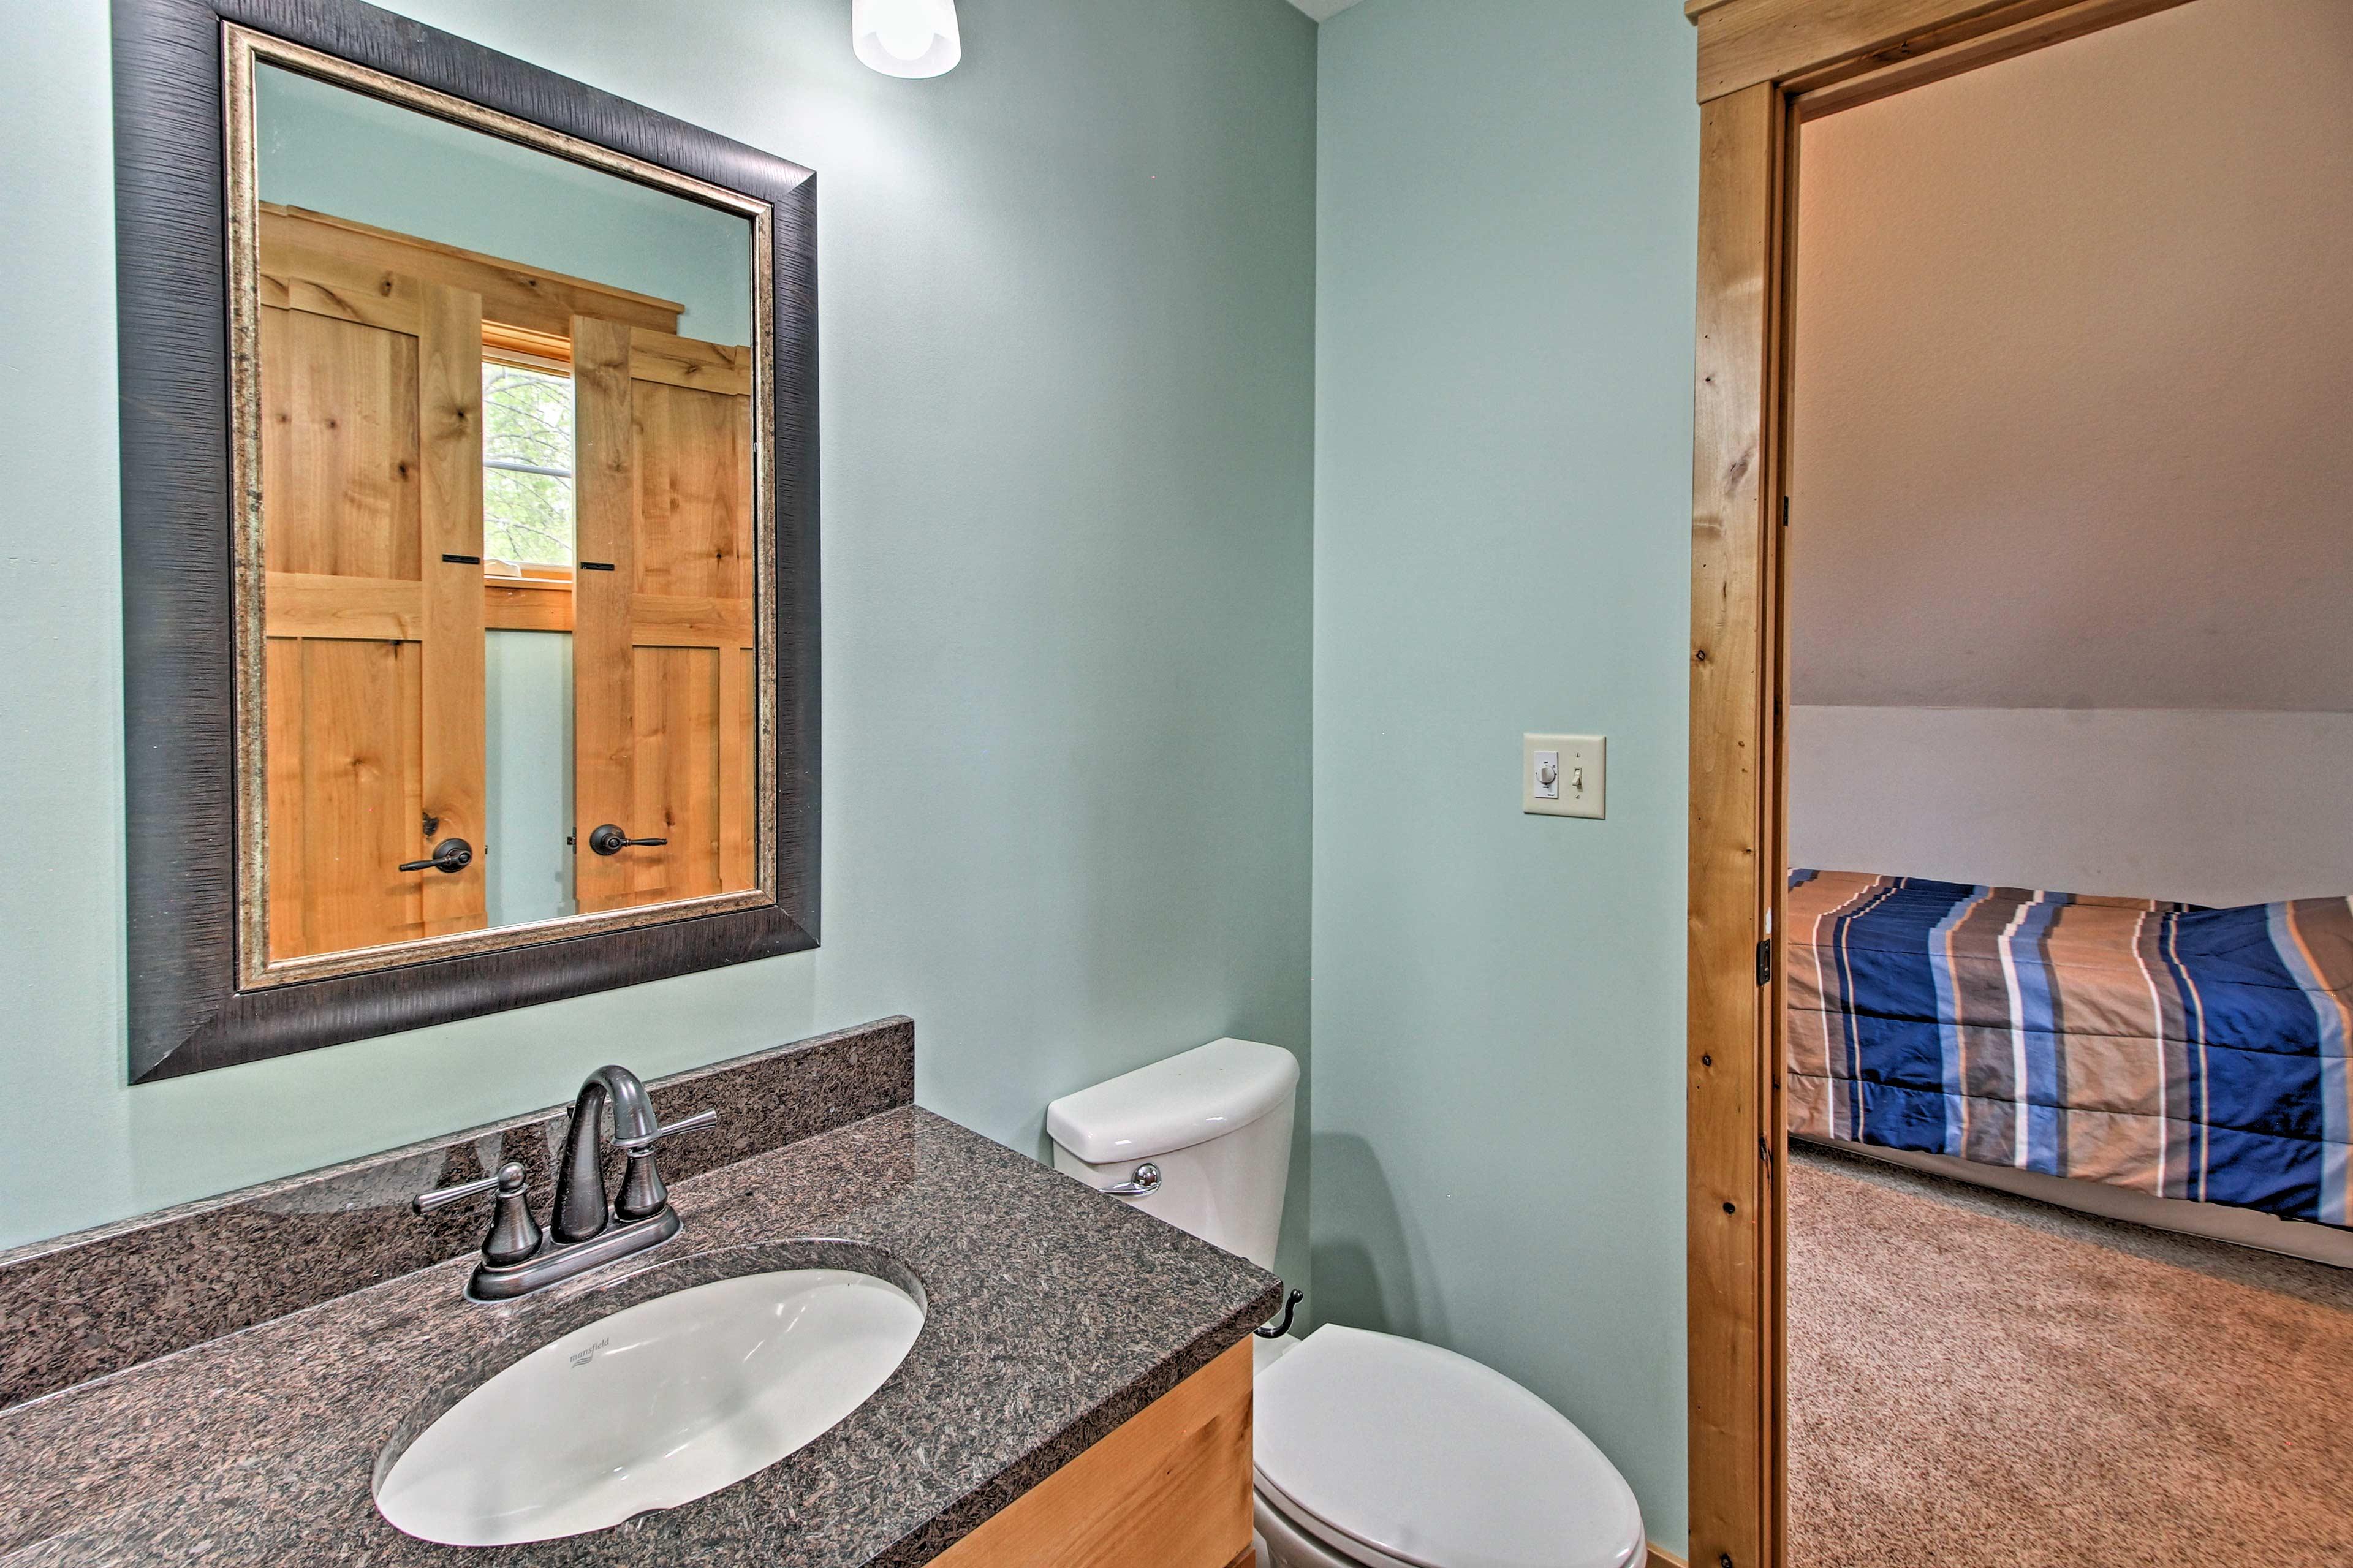 This room has an en-suite bathroom!